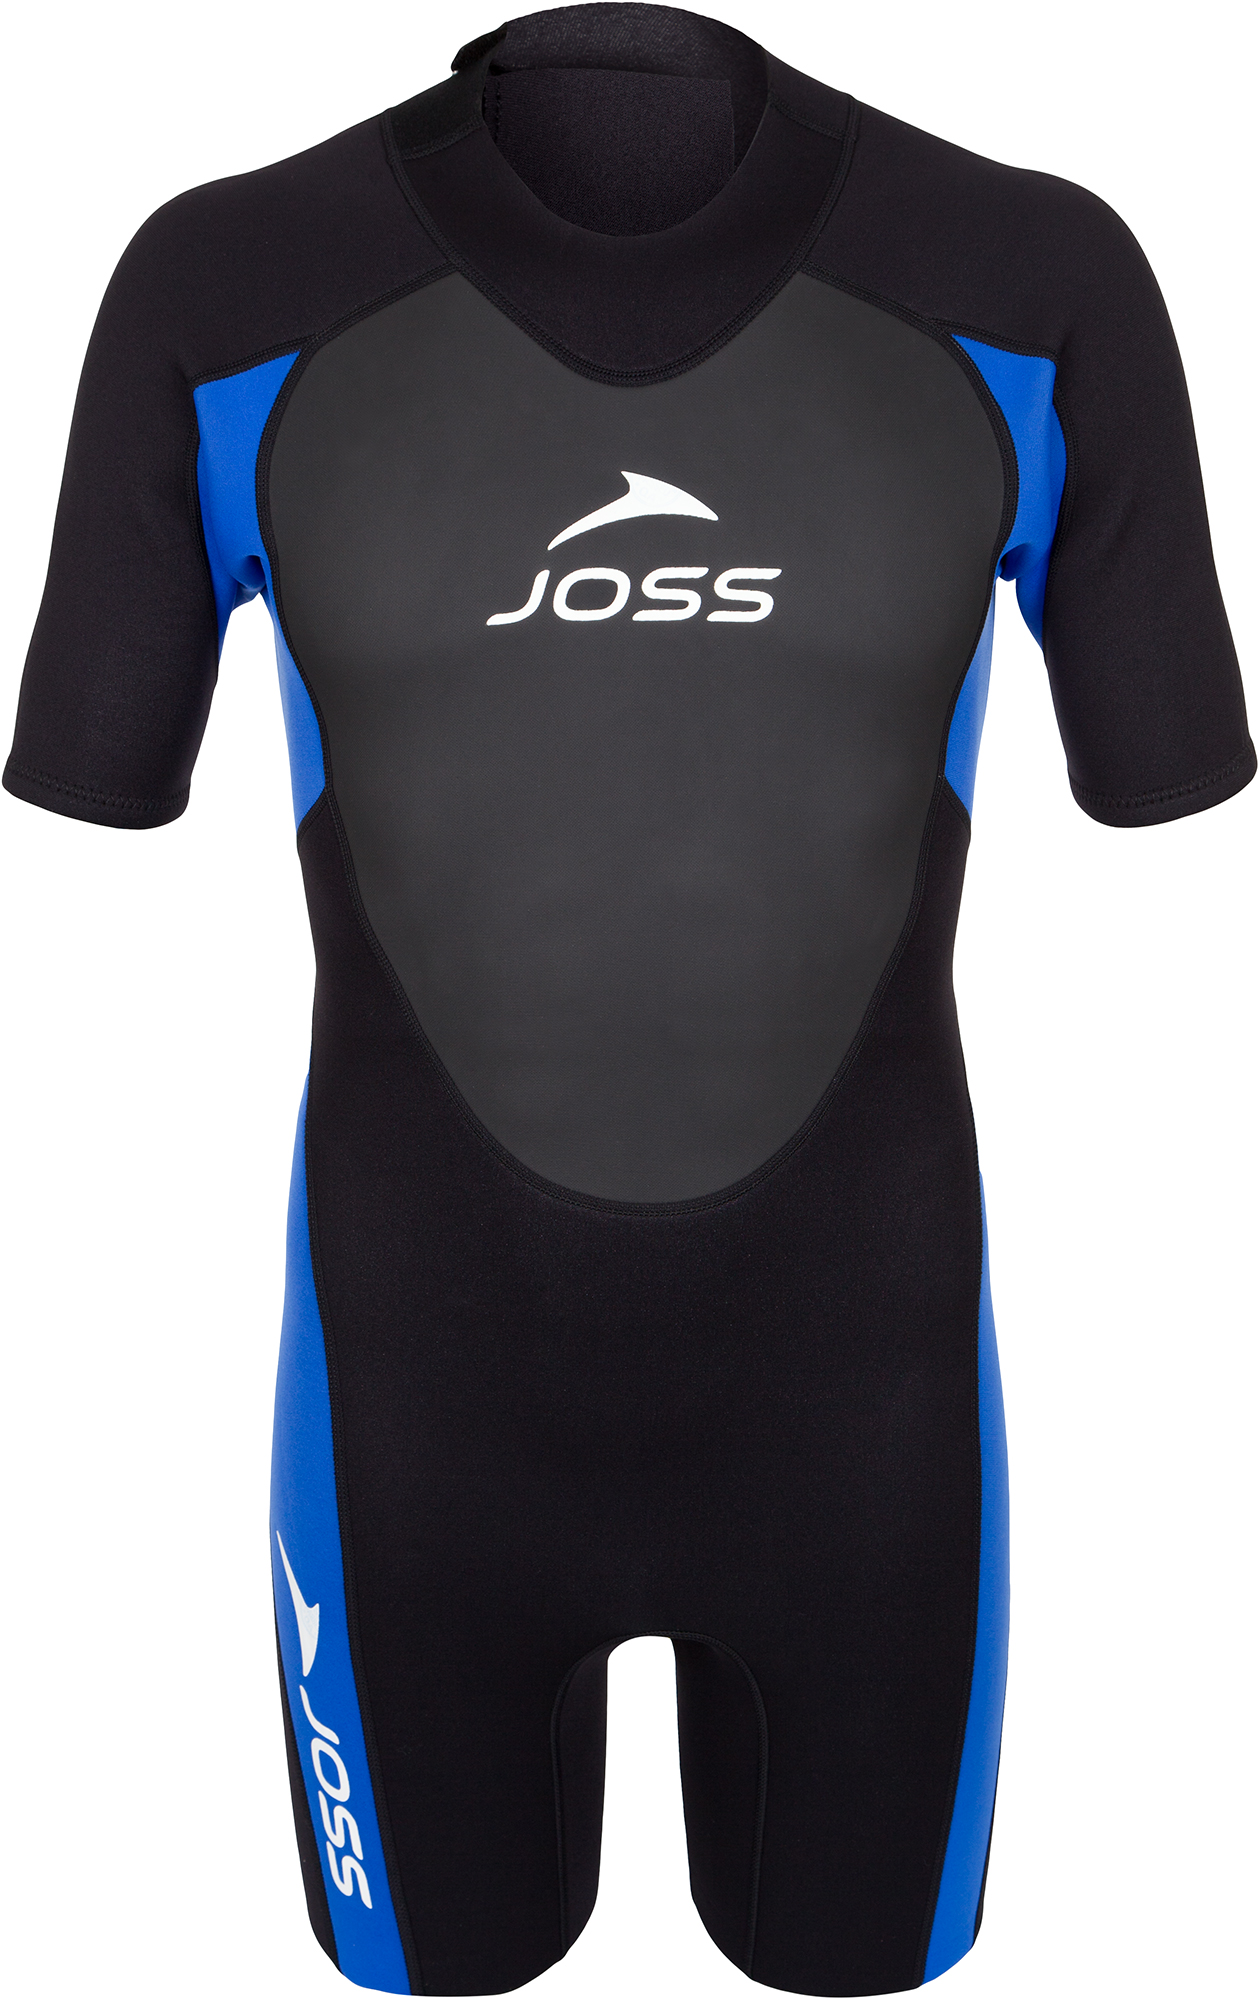 Joss Гидрокостюм короткий мужской 2,5 мм, размер 52